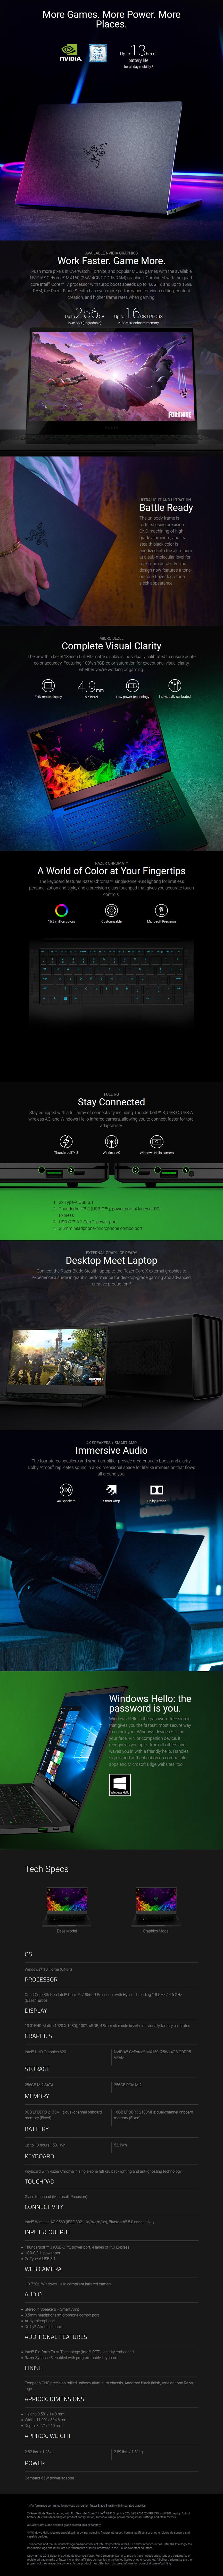 "Razer Blade Stealth 13.3"" FHD Gaming Ultrabook i7-8565U 8GB 256GB UHD 620 Win10 - Desktop Overview 1"